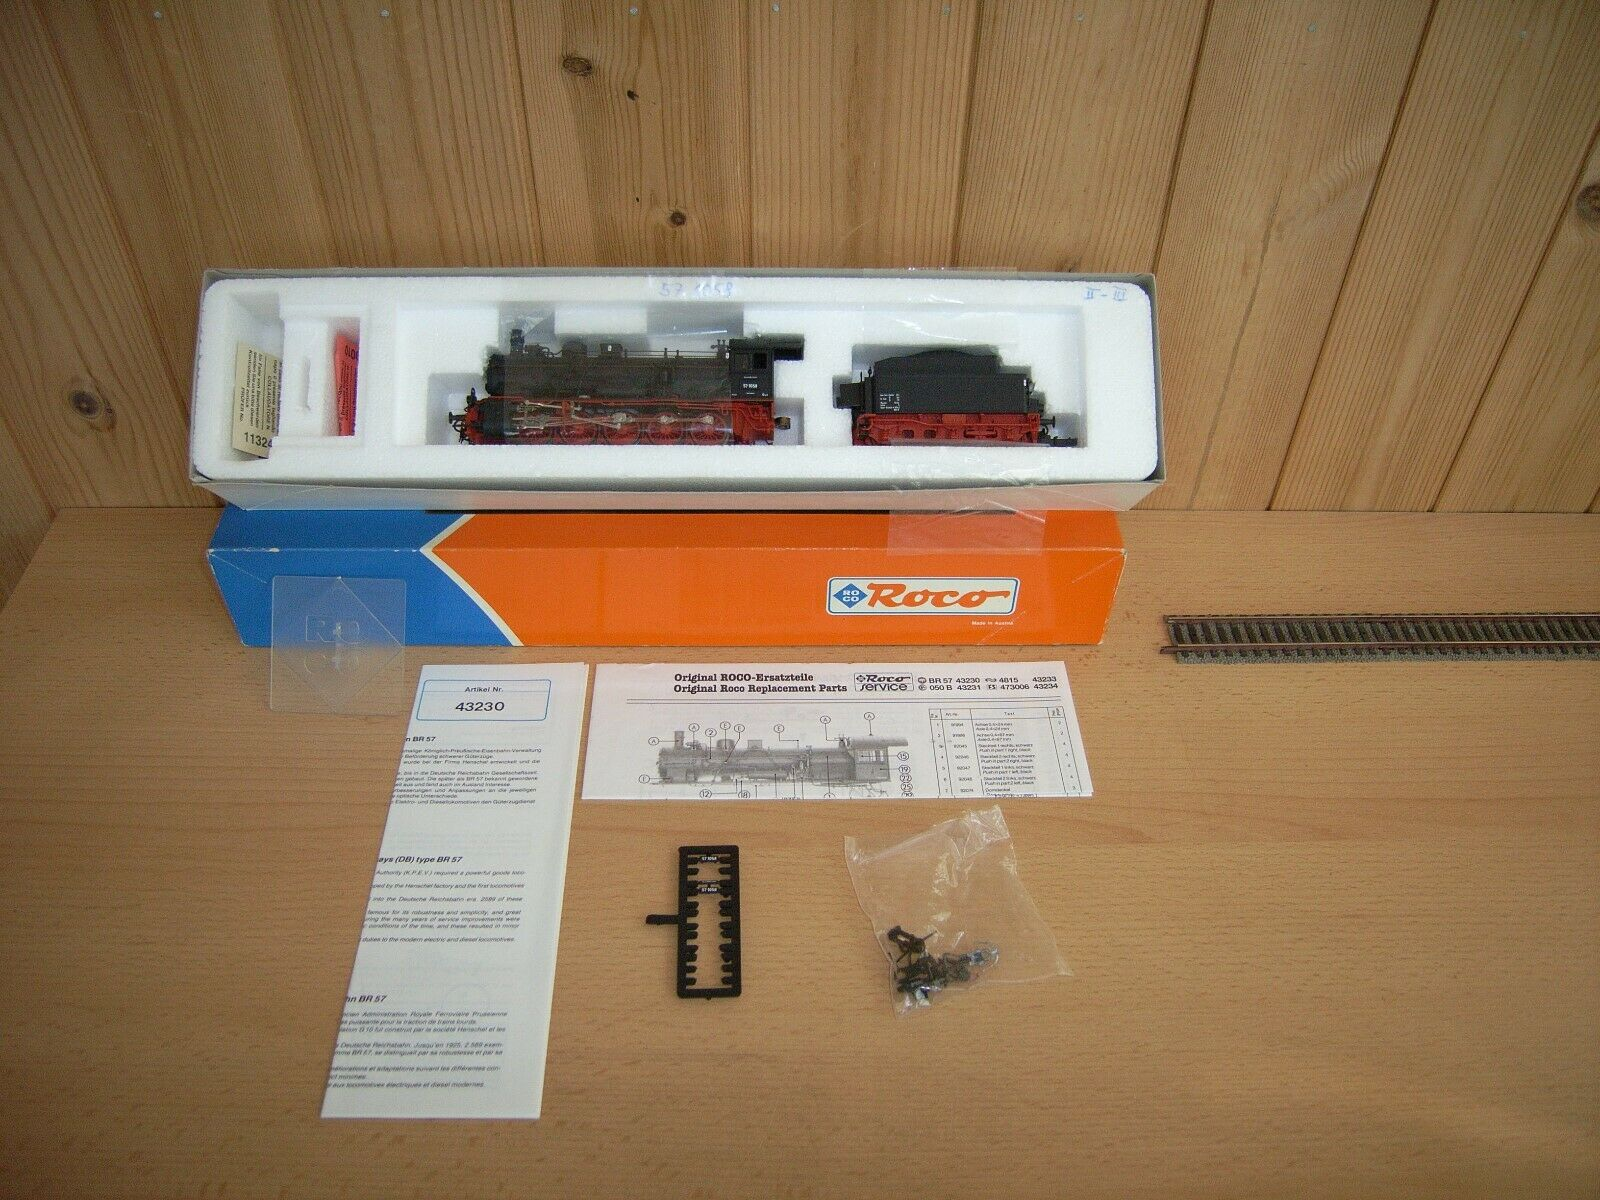 Roco ho 43230  schlepptender-máquina de vapor 57 1058 DRG EP. II; OVP, ersatzteilbl., Inst.